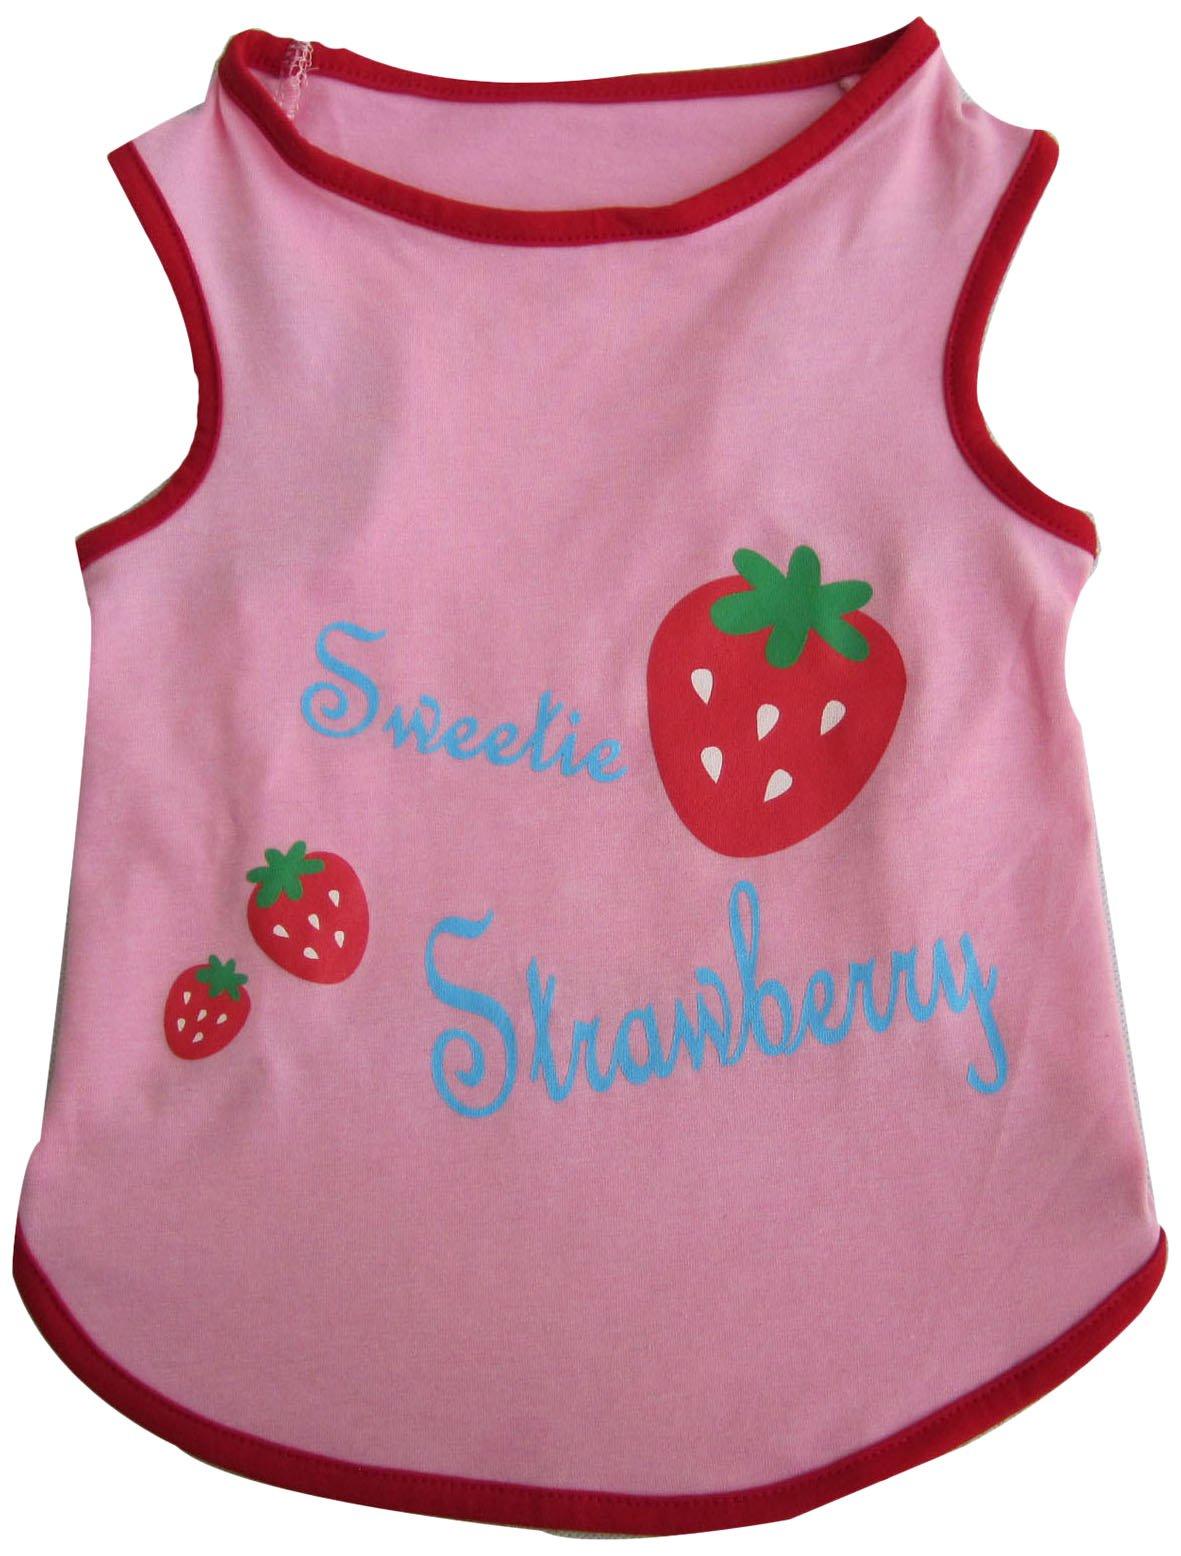 Iconic Pet Pretty Pet Top, Medium, Pink/Strawberry